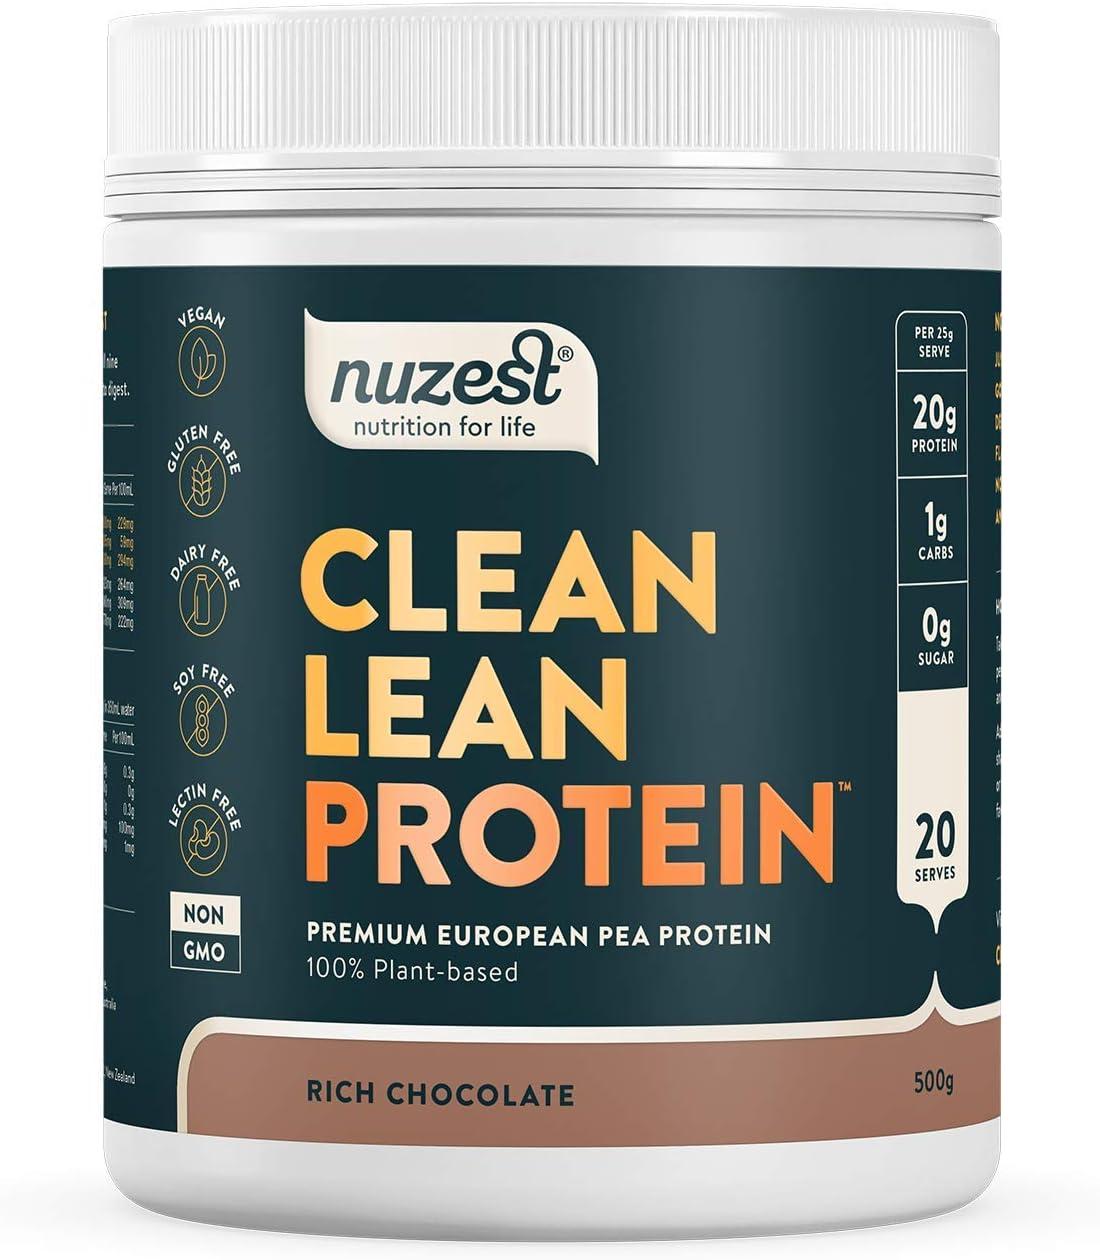 Clean Lean Protein Rich Chocolate 20 Serve - 500g